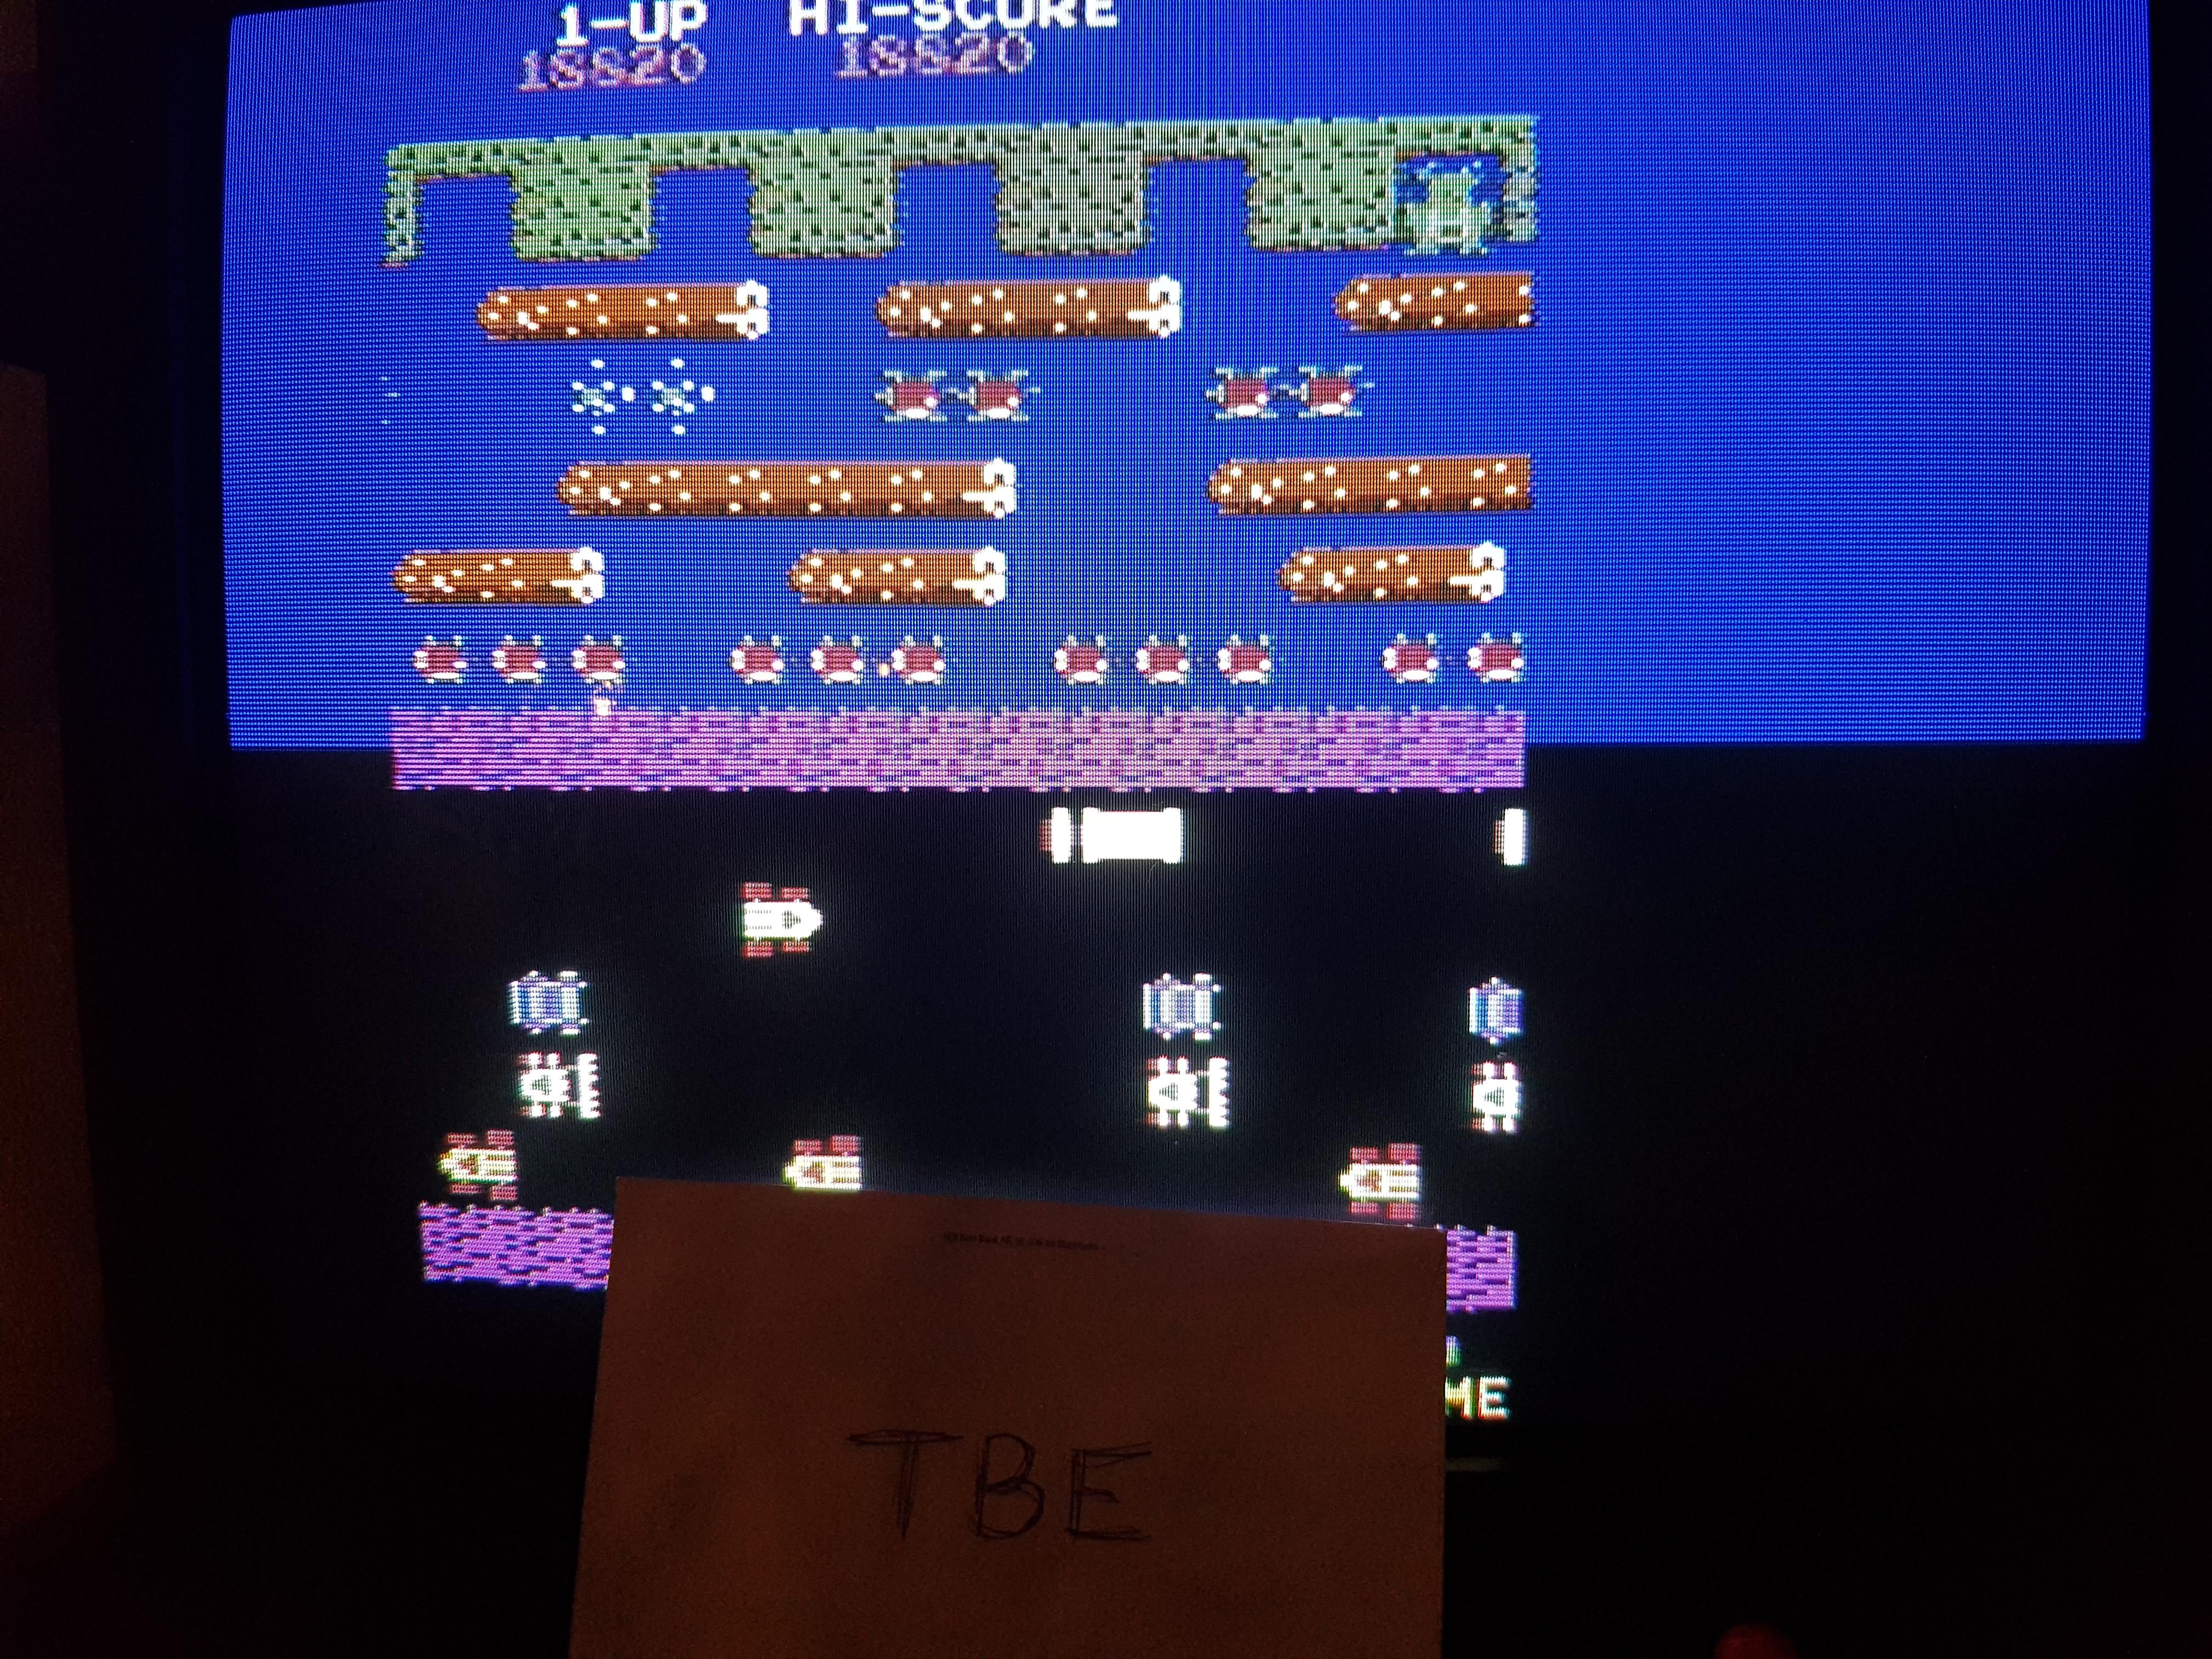 Frogger Arcade 18,820 points